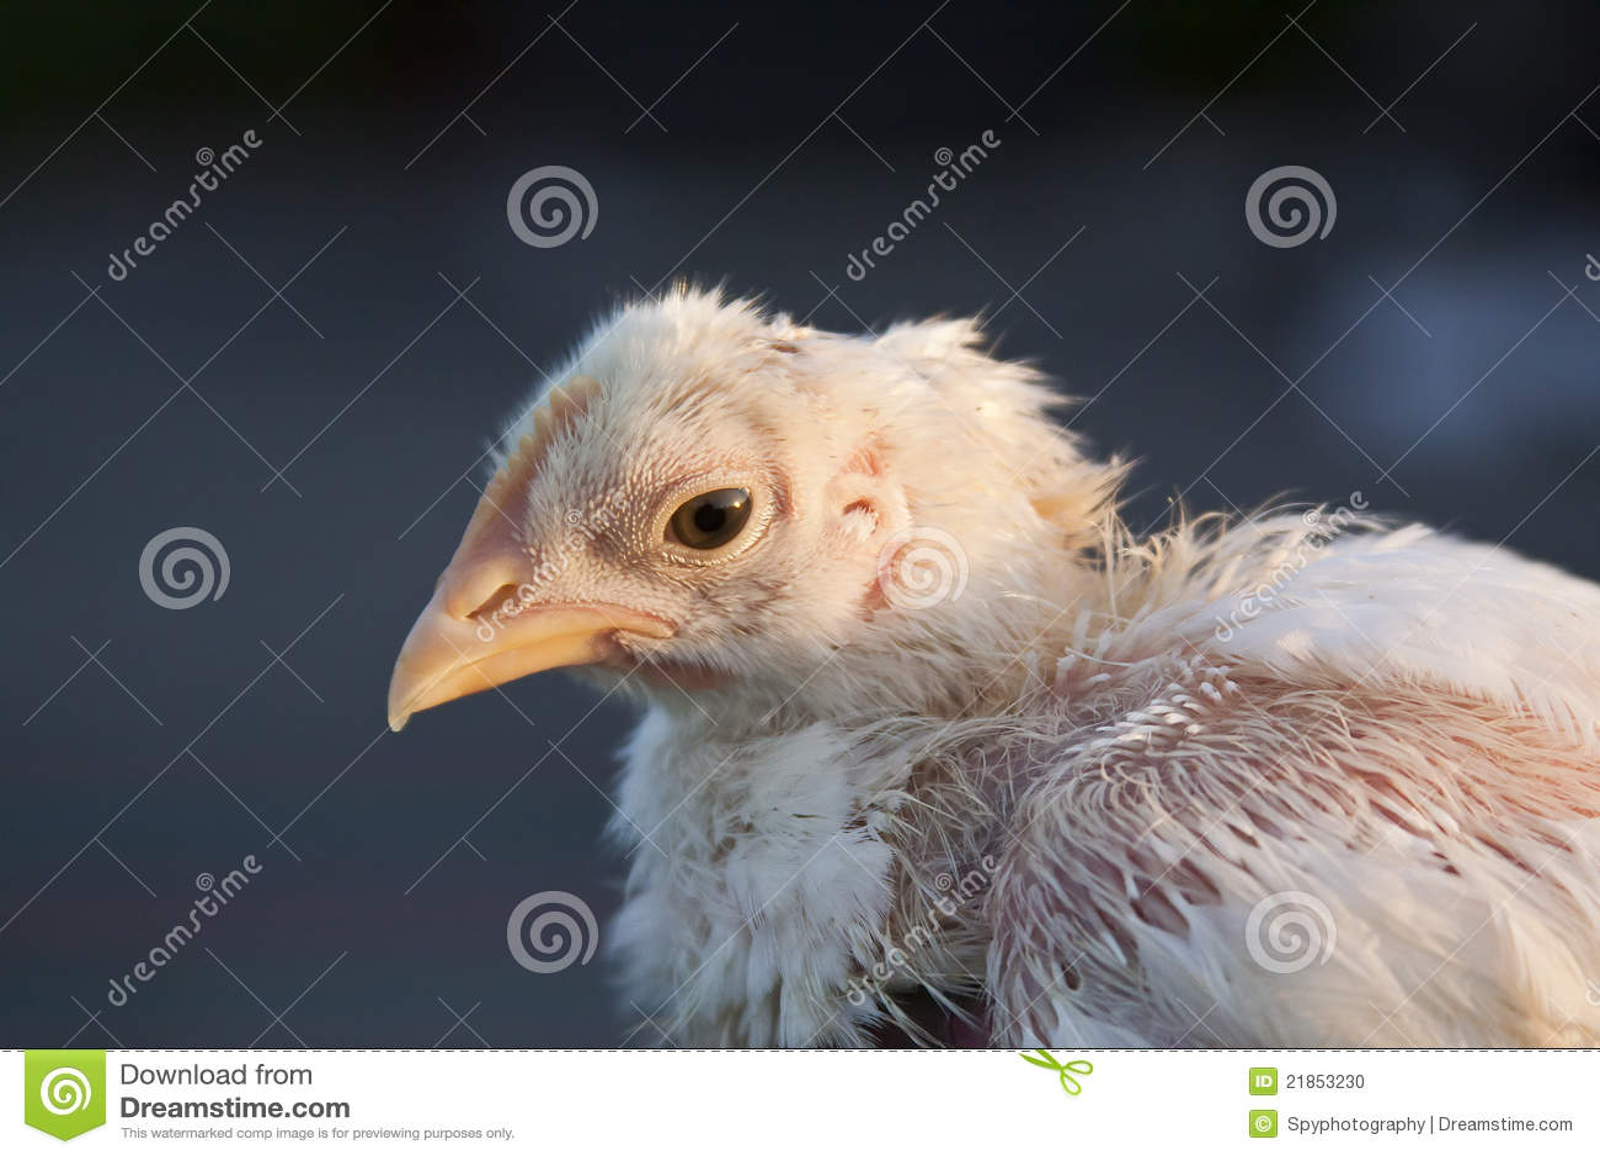 Beat Up Chick